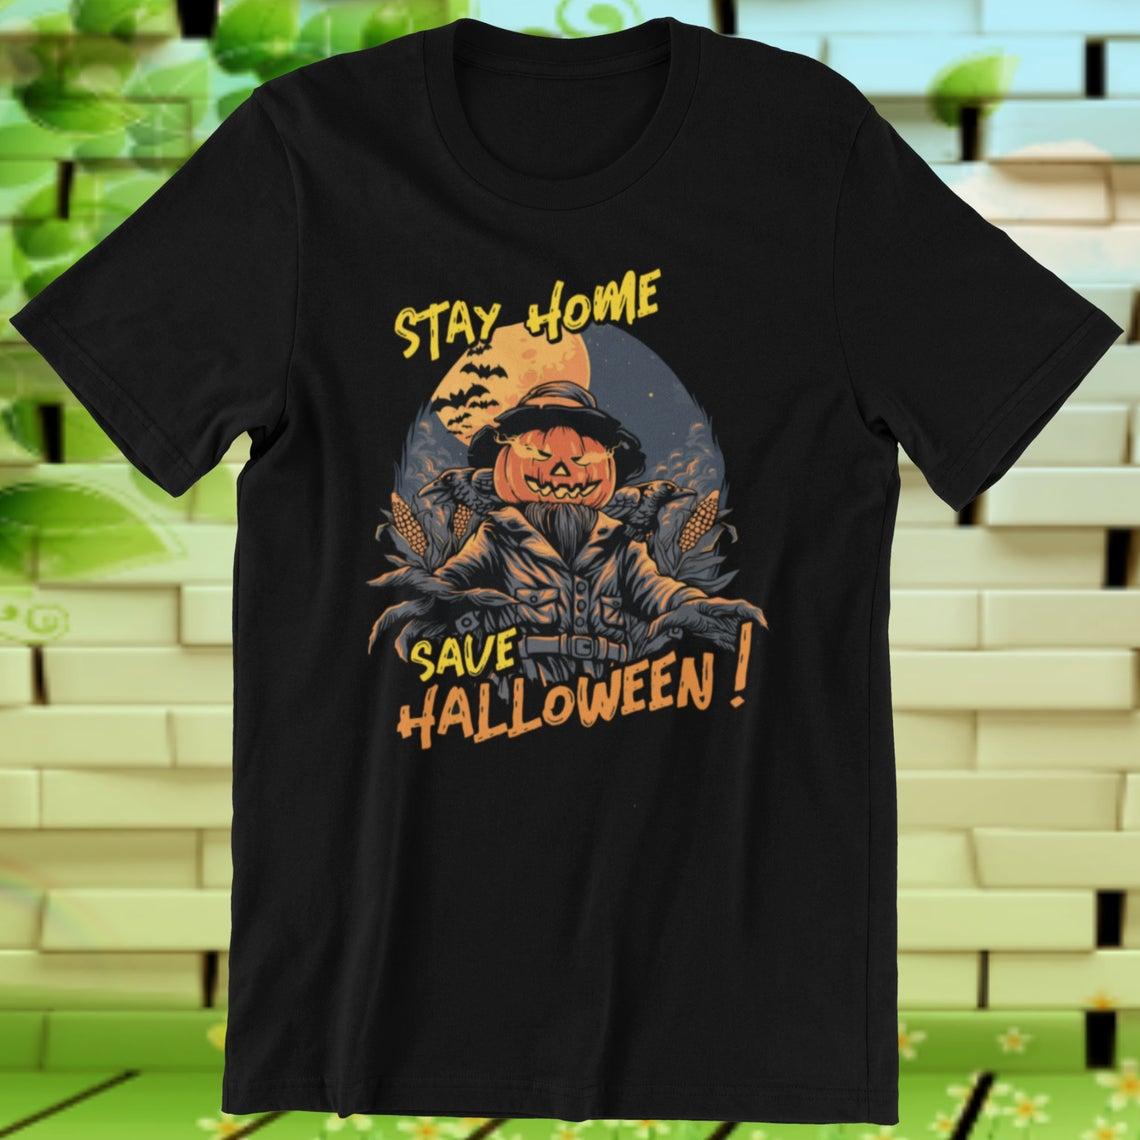 Halloween Shirt Stay Home Save Halloween